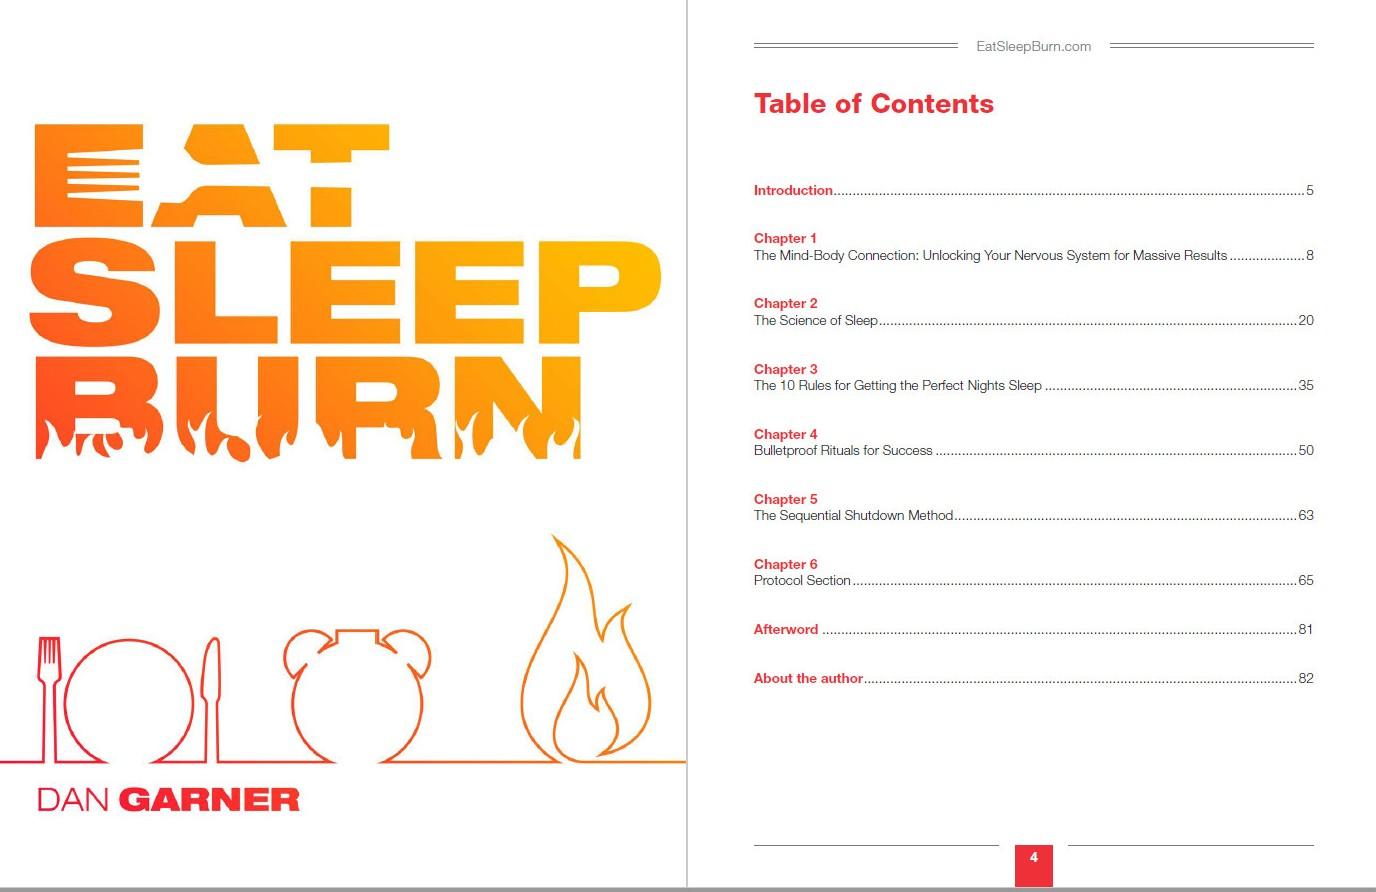 eat sleep burn table of contents